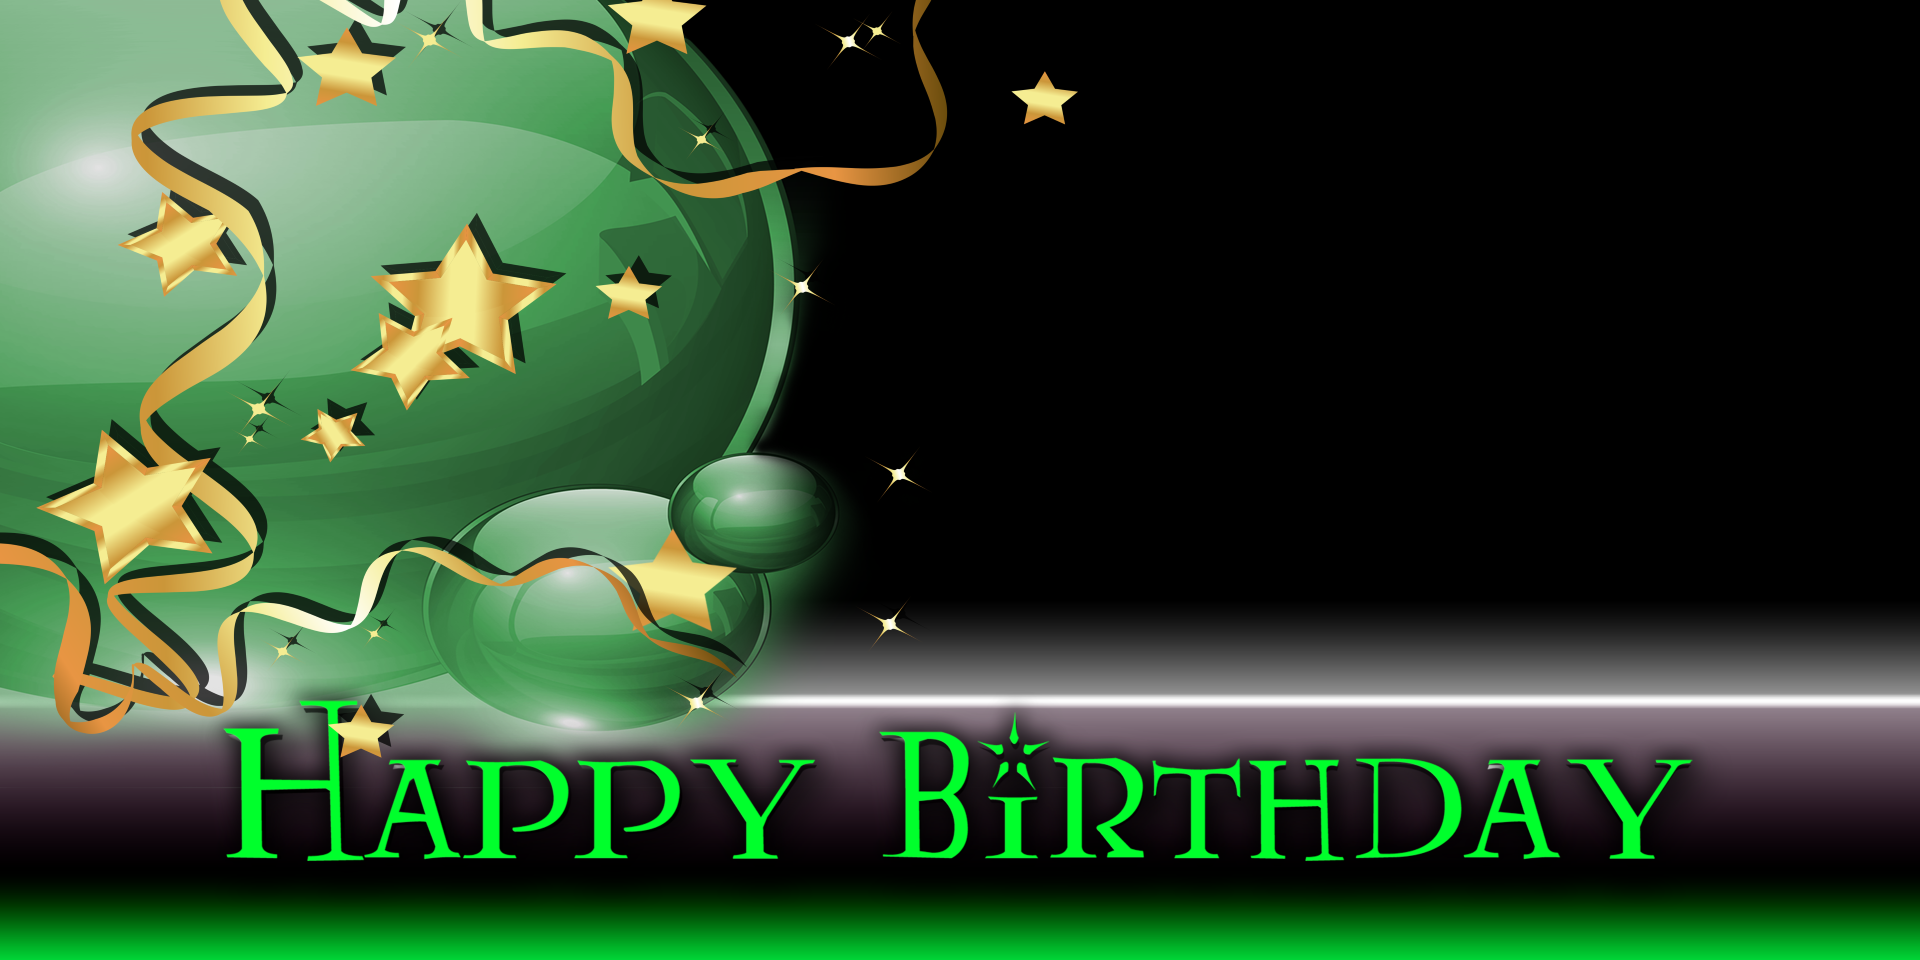 Top Happy Birthday Banner - Star Balloon Green - Vinyl Banners  EH35